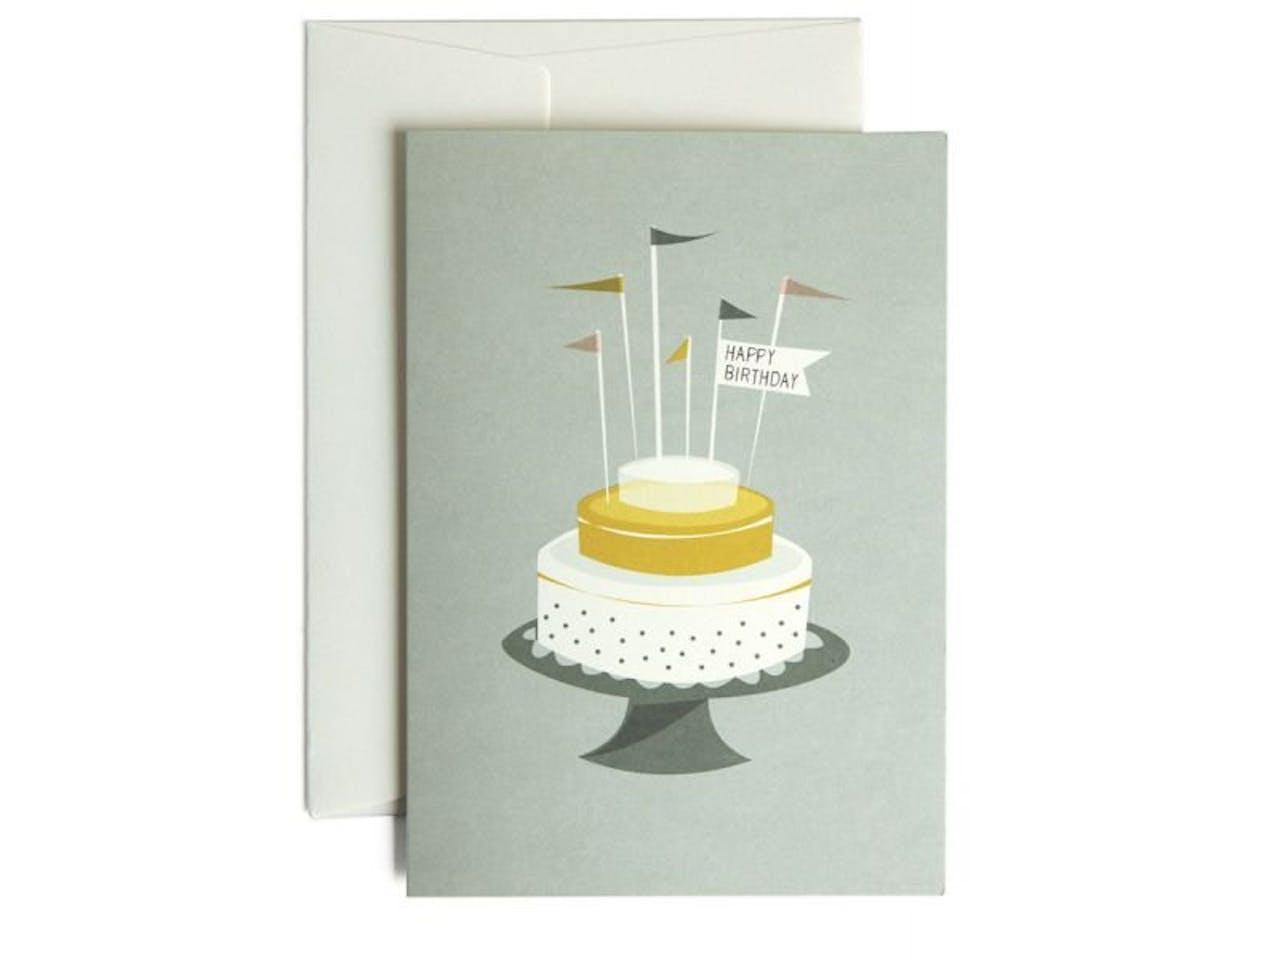 Pleased to meet Grußkarte, DIN A6/C6, Klappkarte mit Kuvert, Birthday Cake